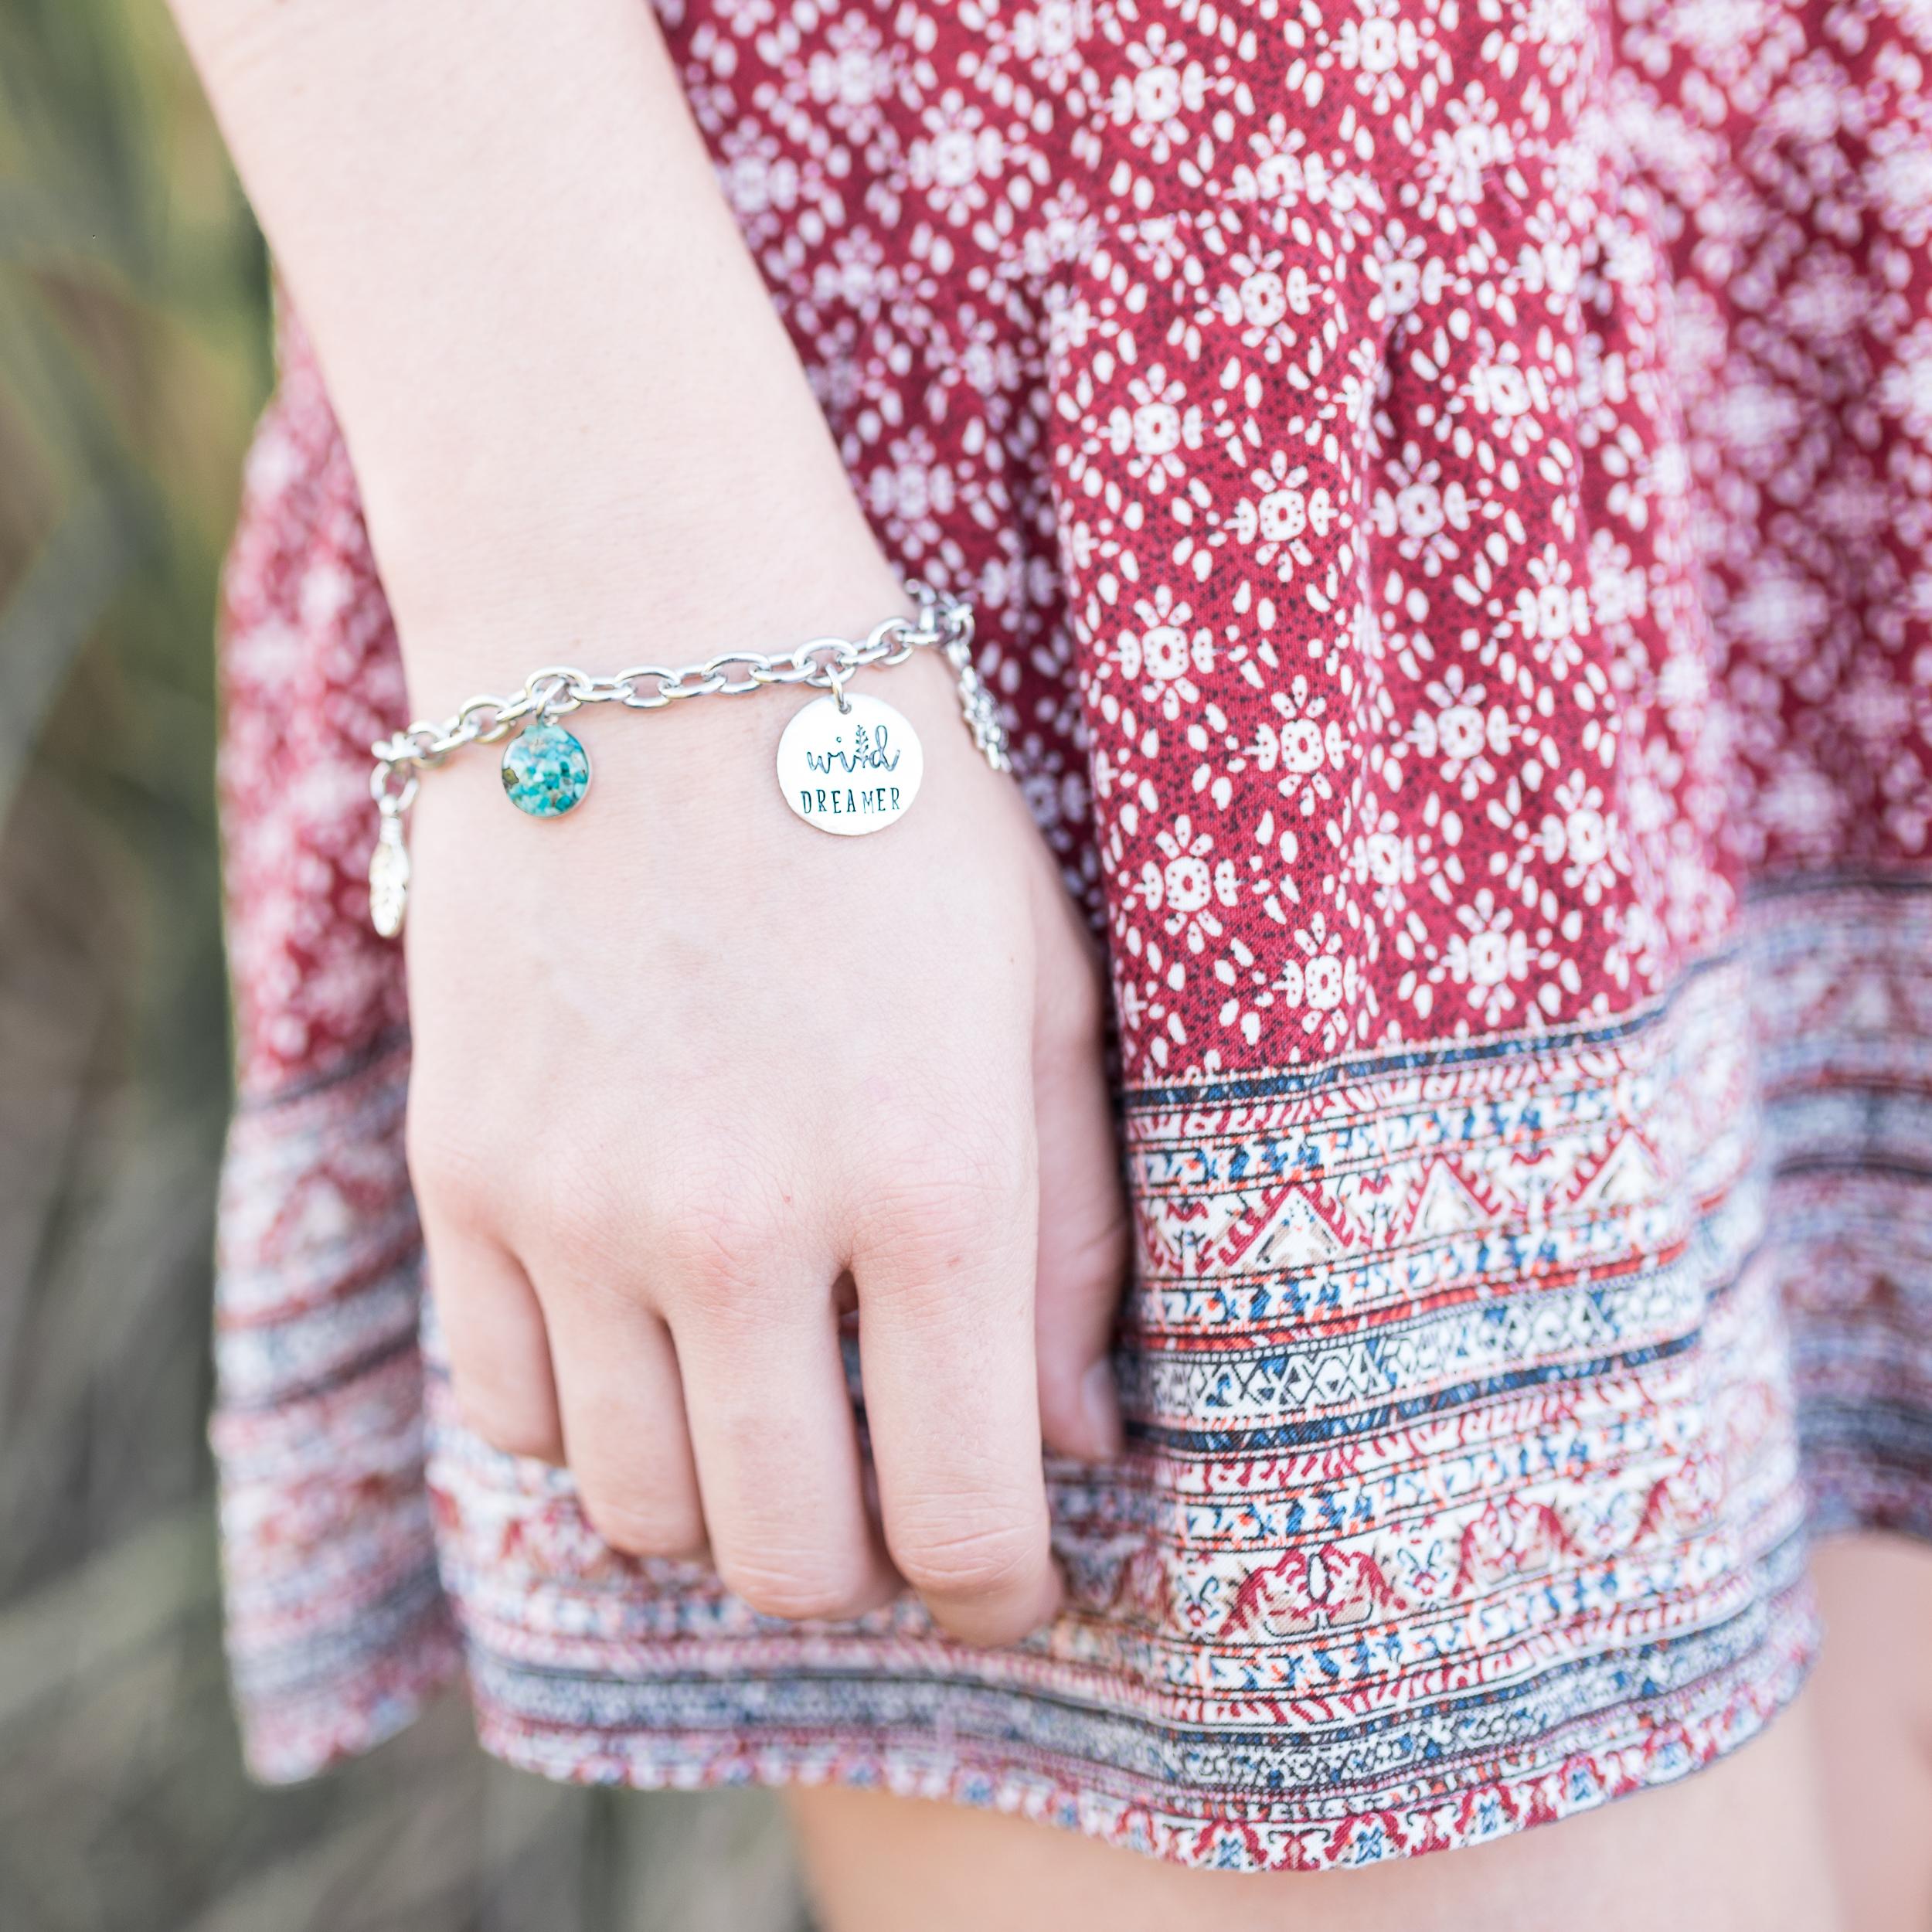 jewelry-branding-photography-guam-roxanne-augusta-10.jpg